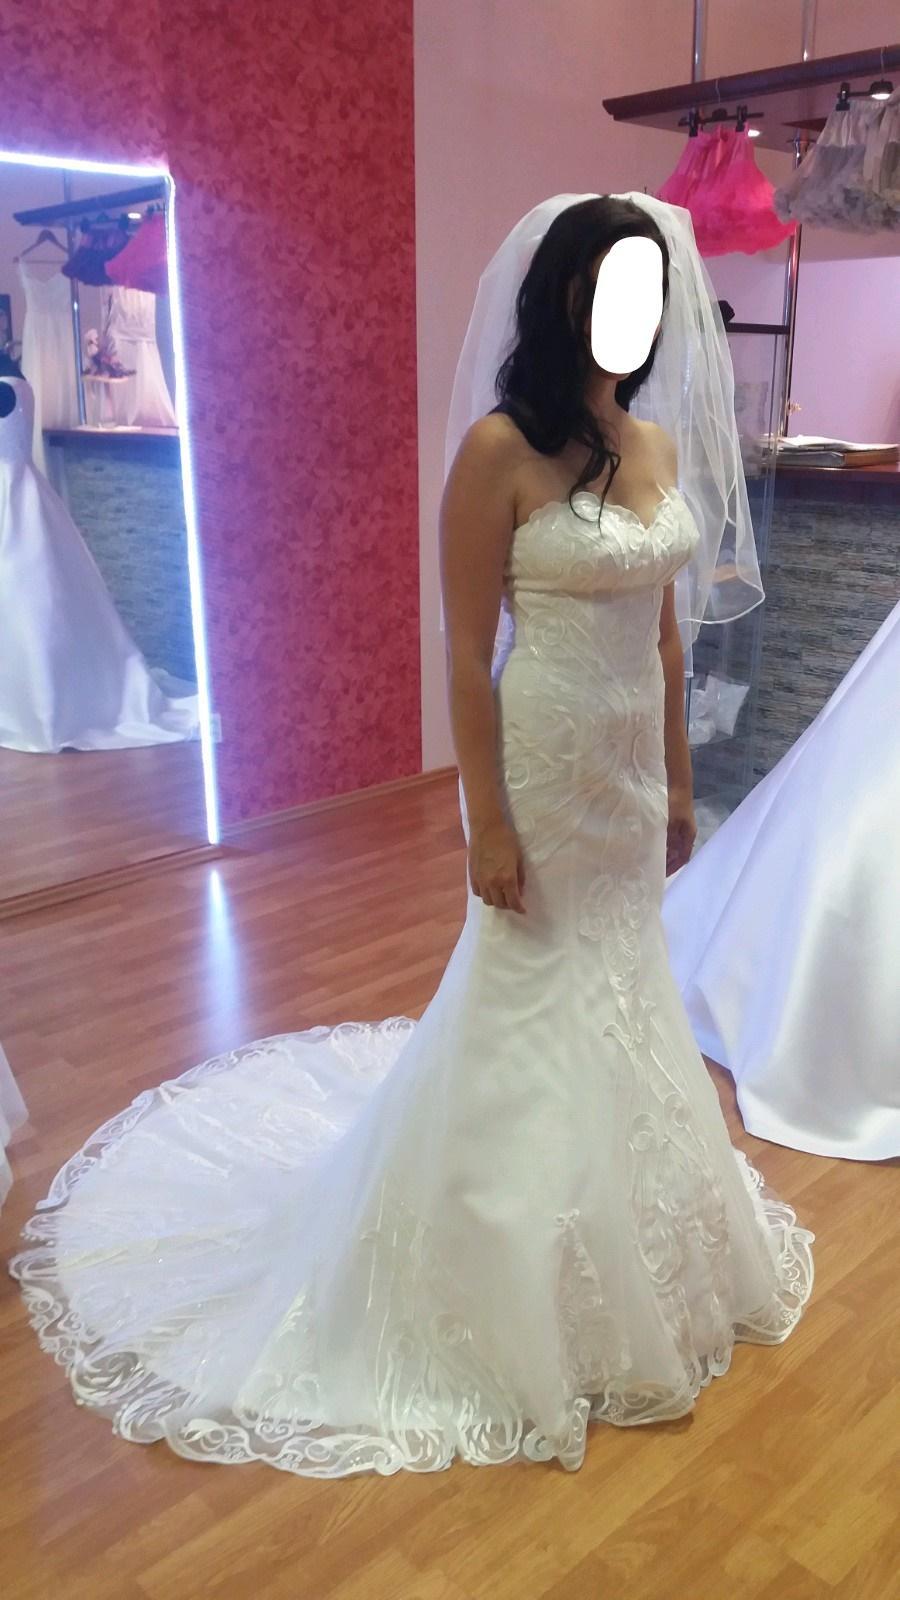 Svadobné šaty s 3d čipkou v ivory farbe - Obrázok č. 4